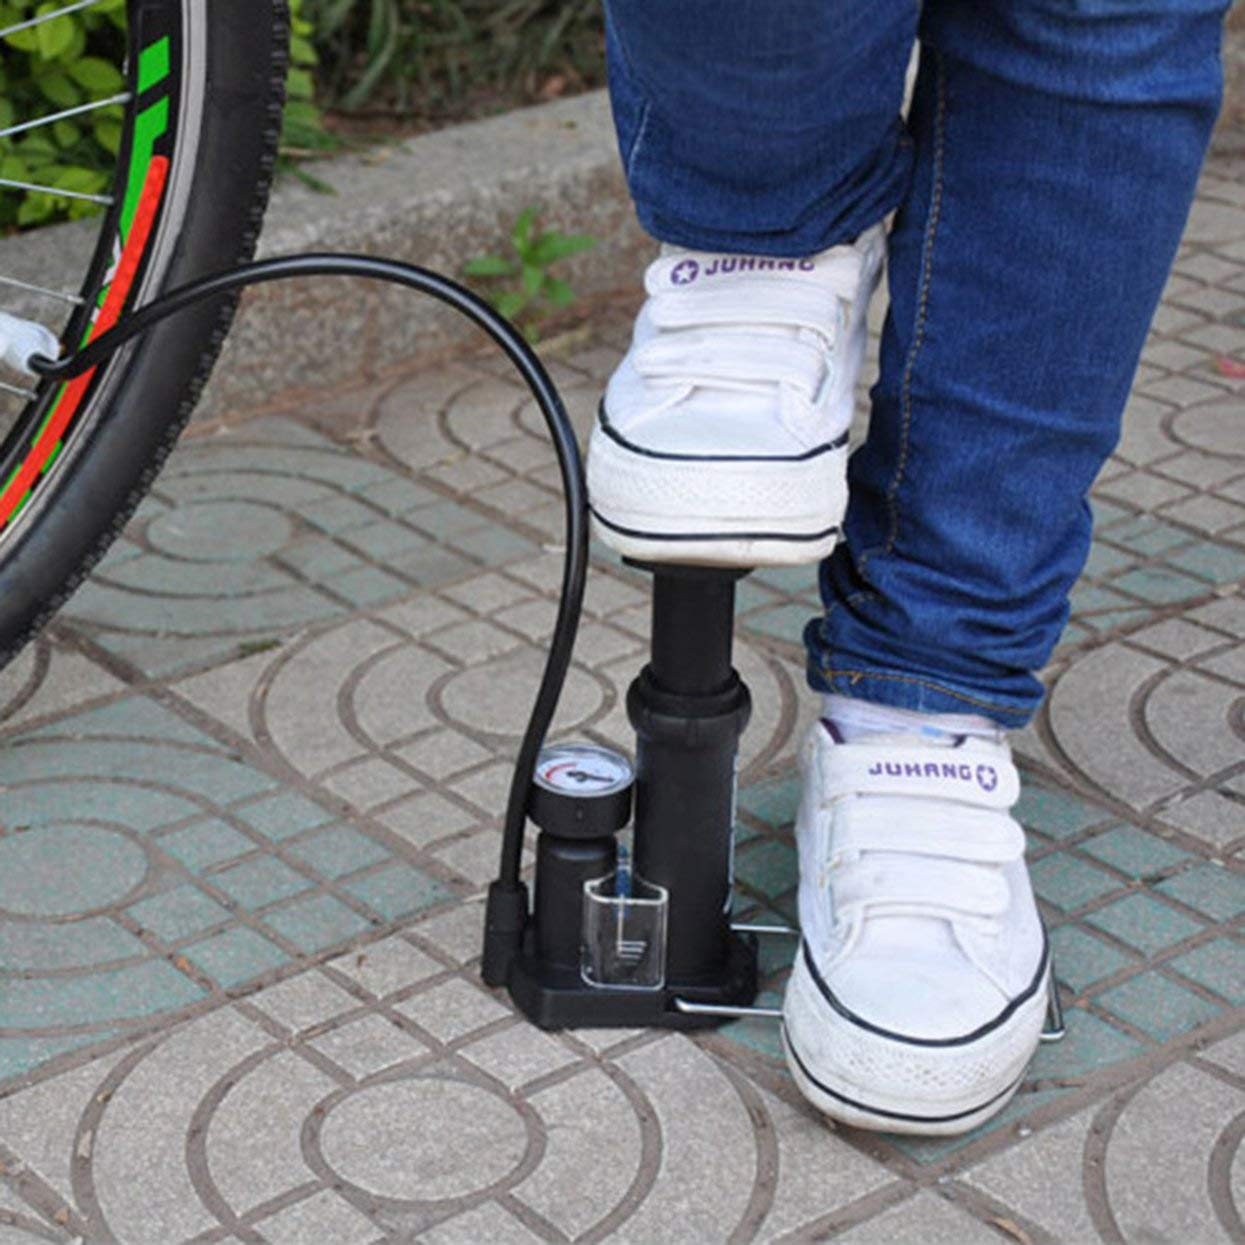 Lamijca Mini High Pressure Air Pump Bike Tire Ball Floor Foot Mountain Bike Cycling Bicycle Pump with Pressure Gauges